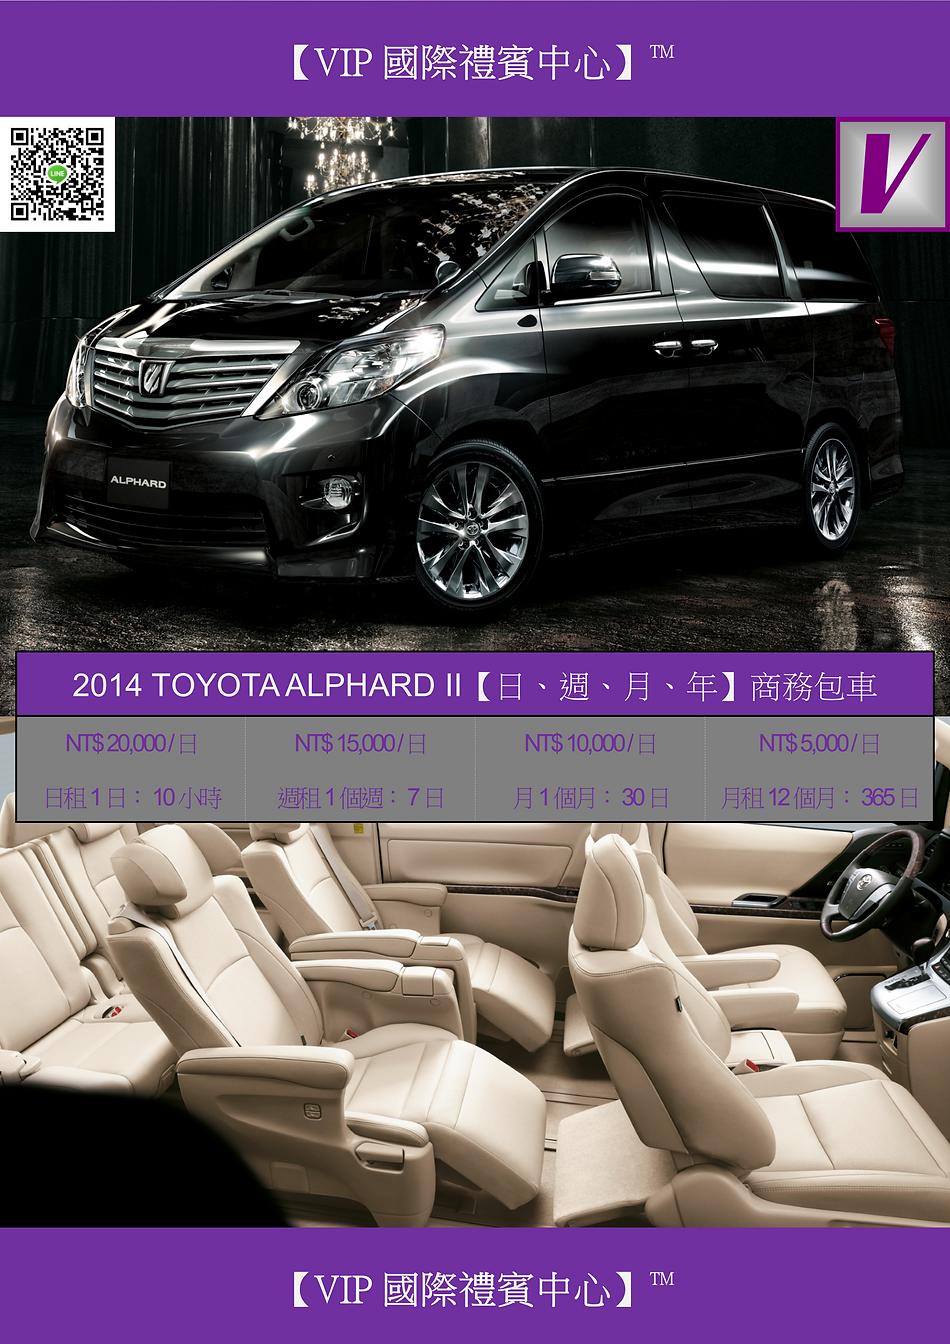 VIP國際禮賓中心 2014 TOYOTA ALPHARD II DM.png